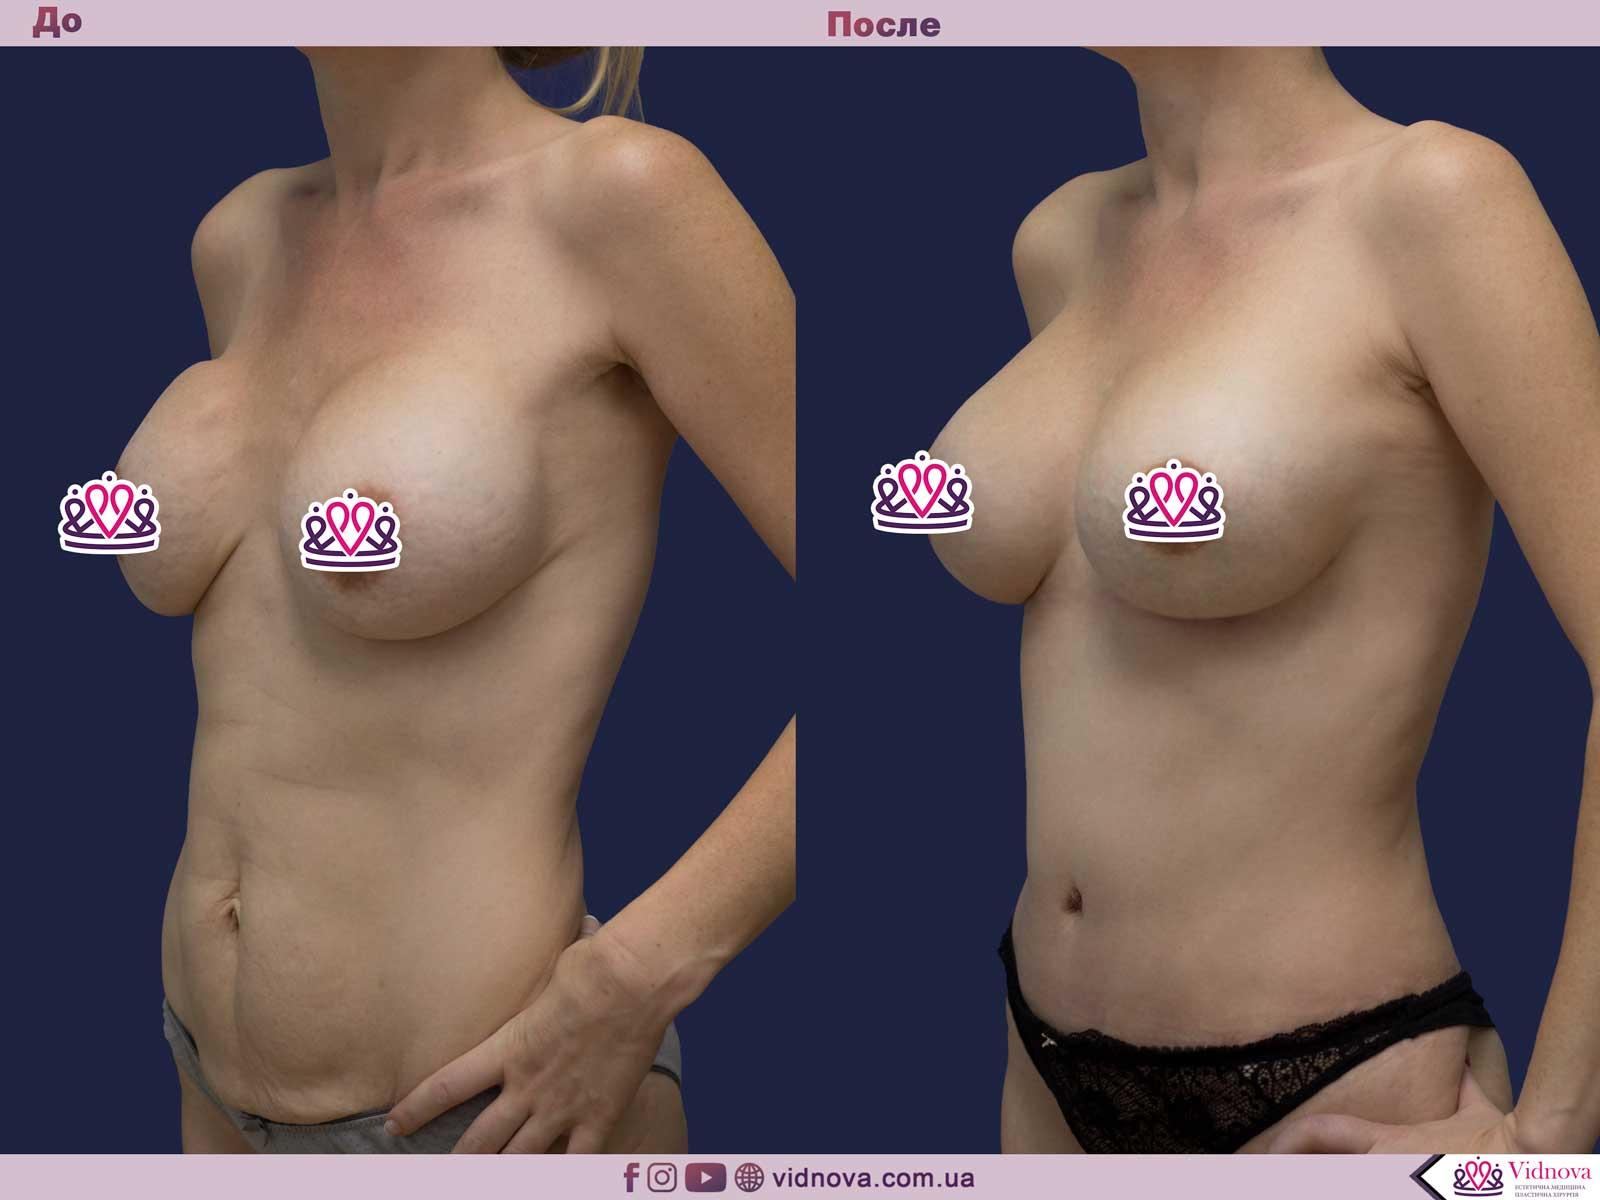 Увеличение груди: Фото ДО и ПОСЛЕ - Пример №82-2 - Клиника Vidnova